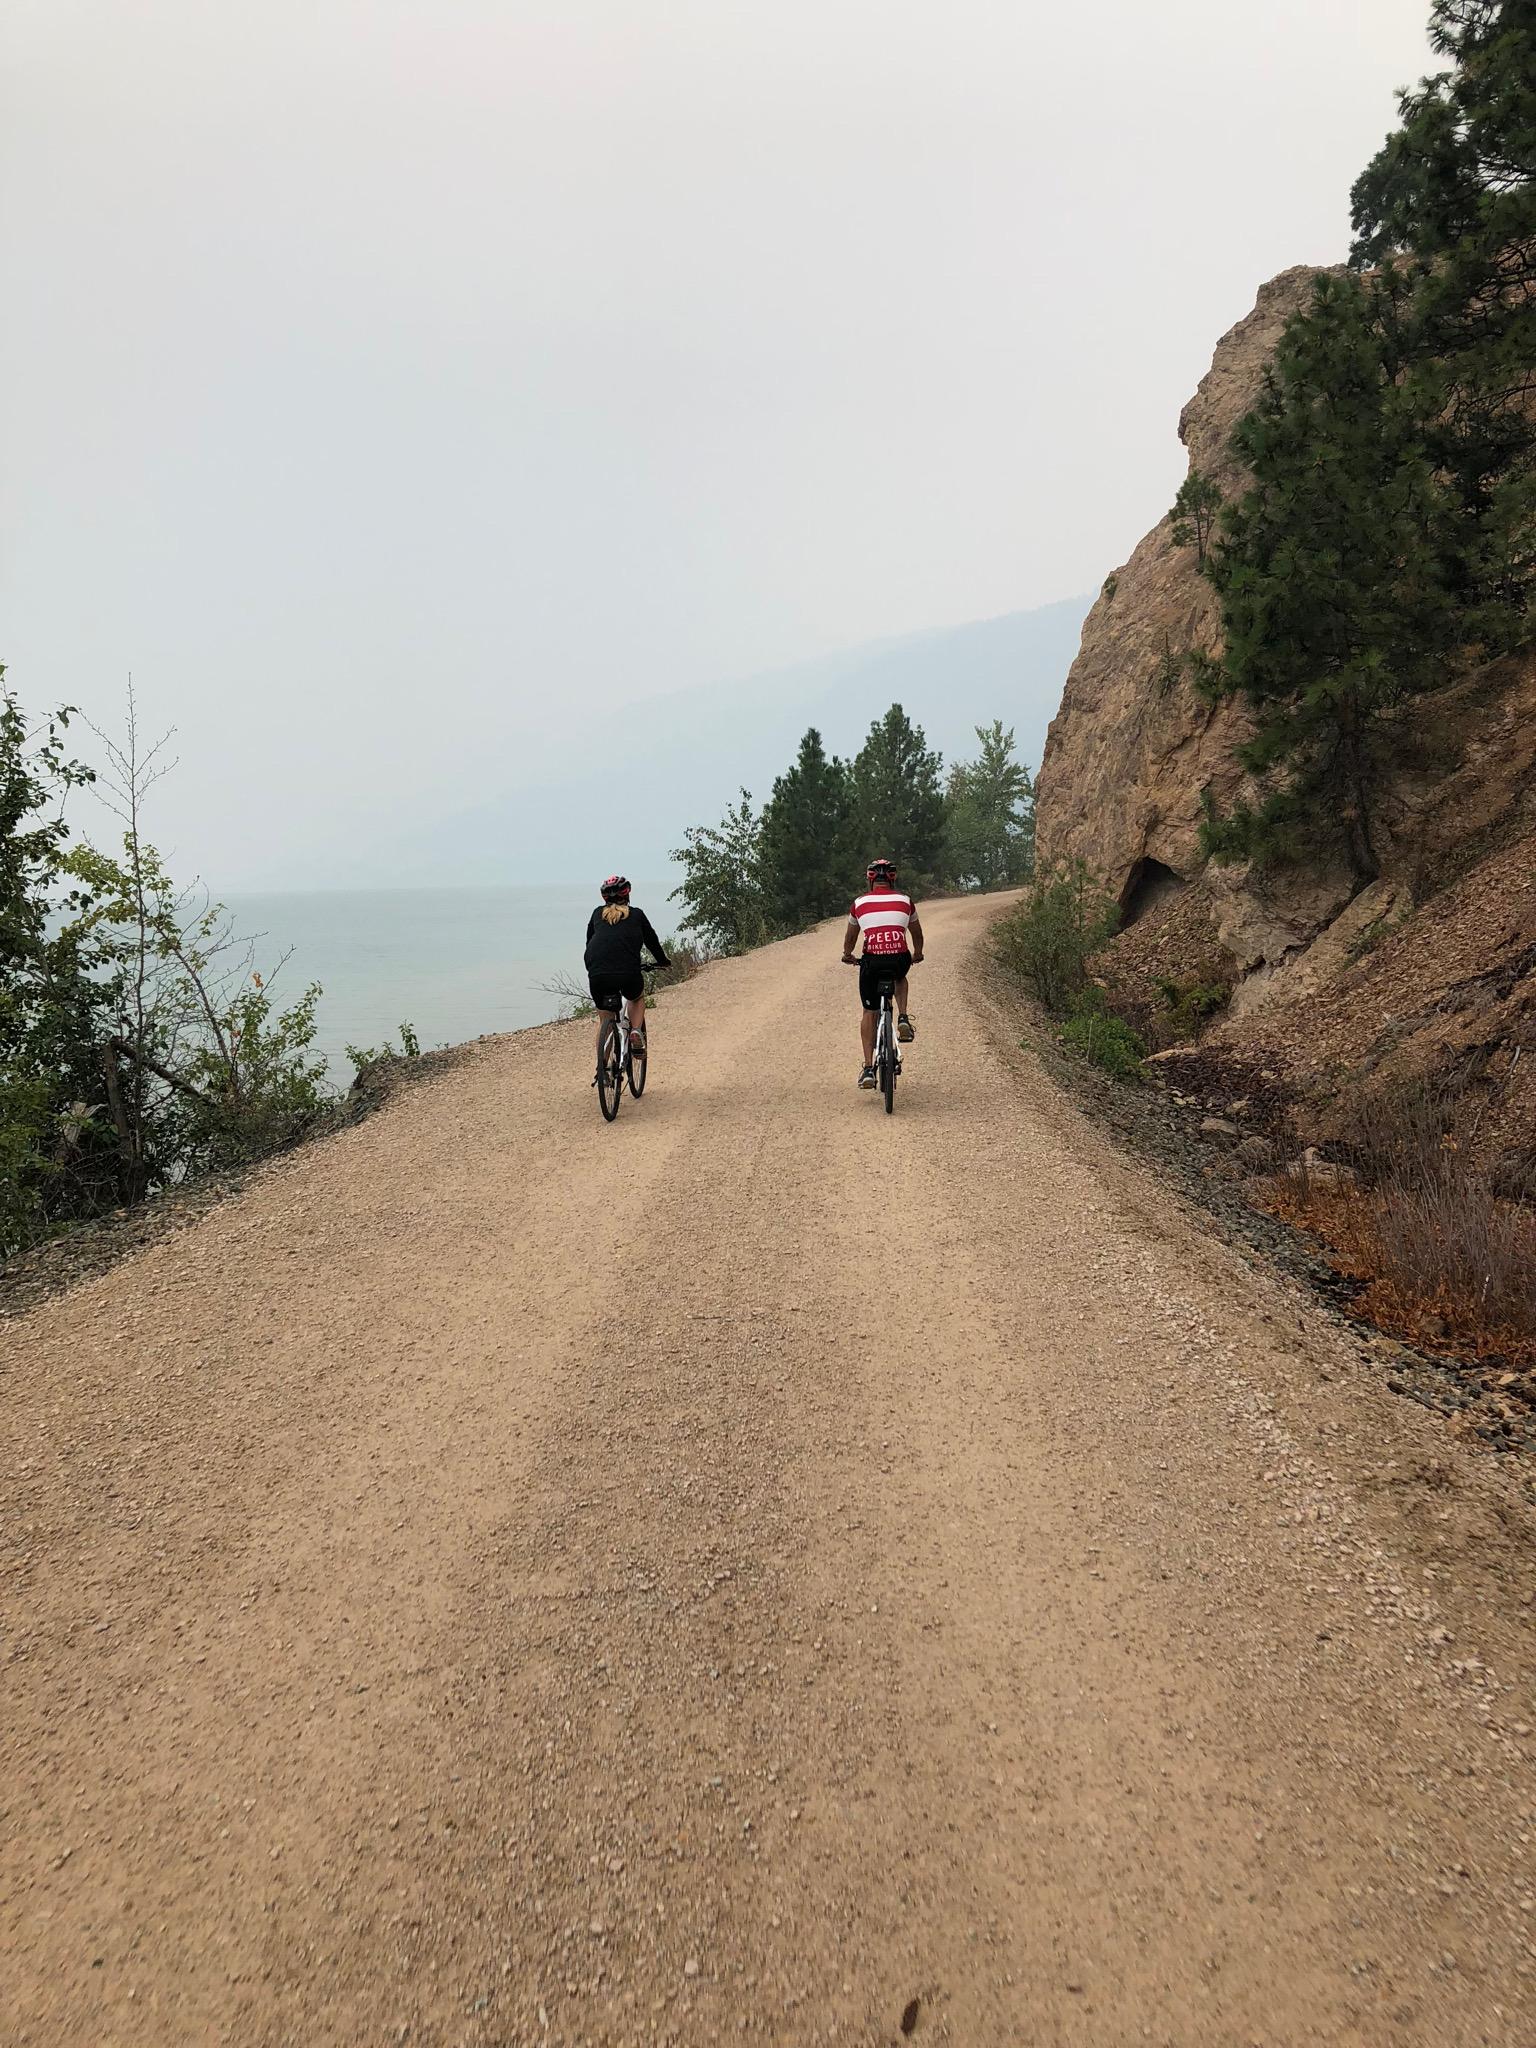 The Lake Country Rail Trail